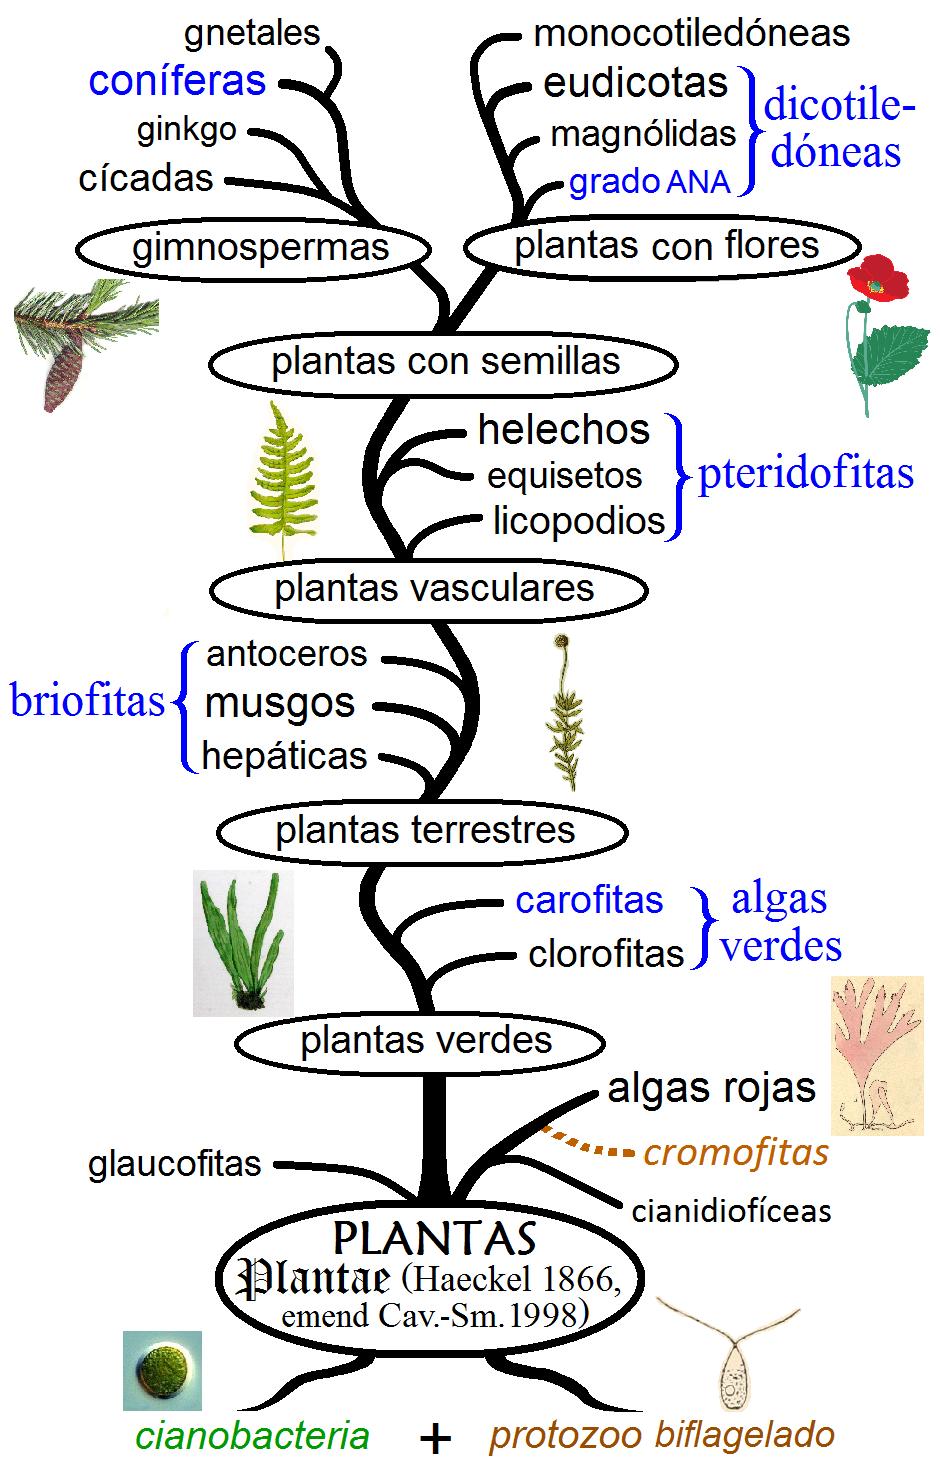 Historia evolutiva de las plantas Wikiwand